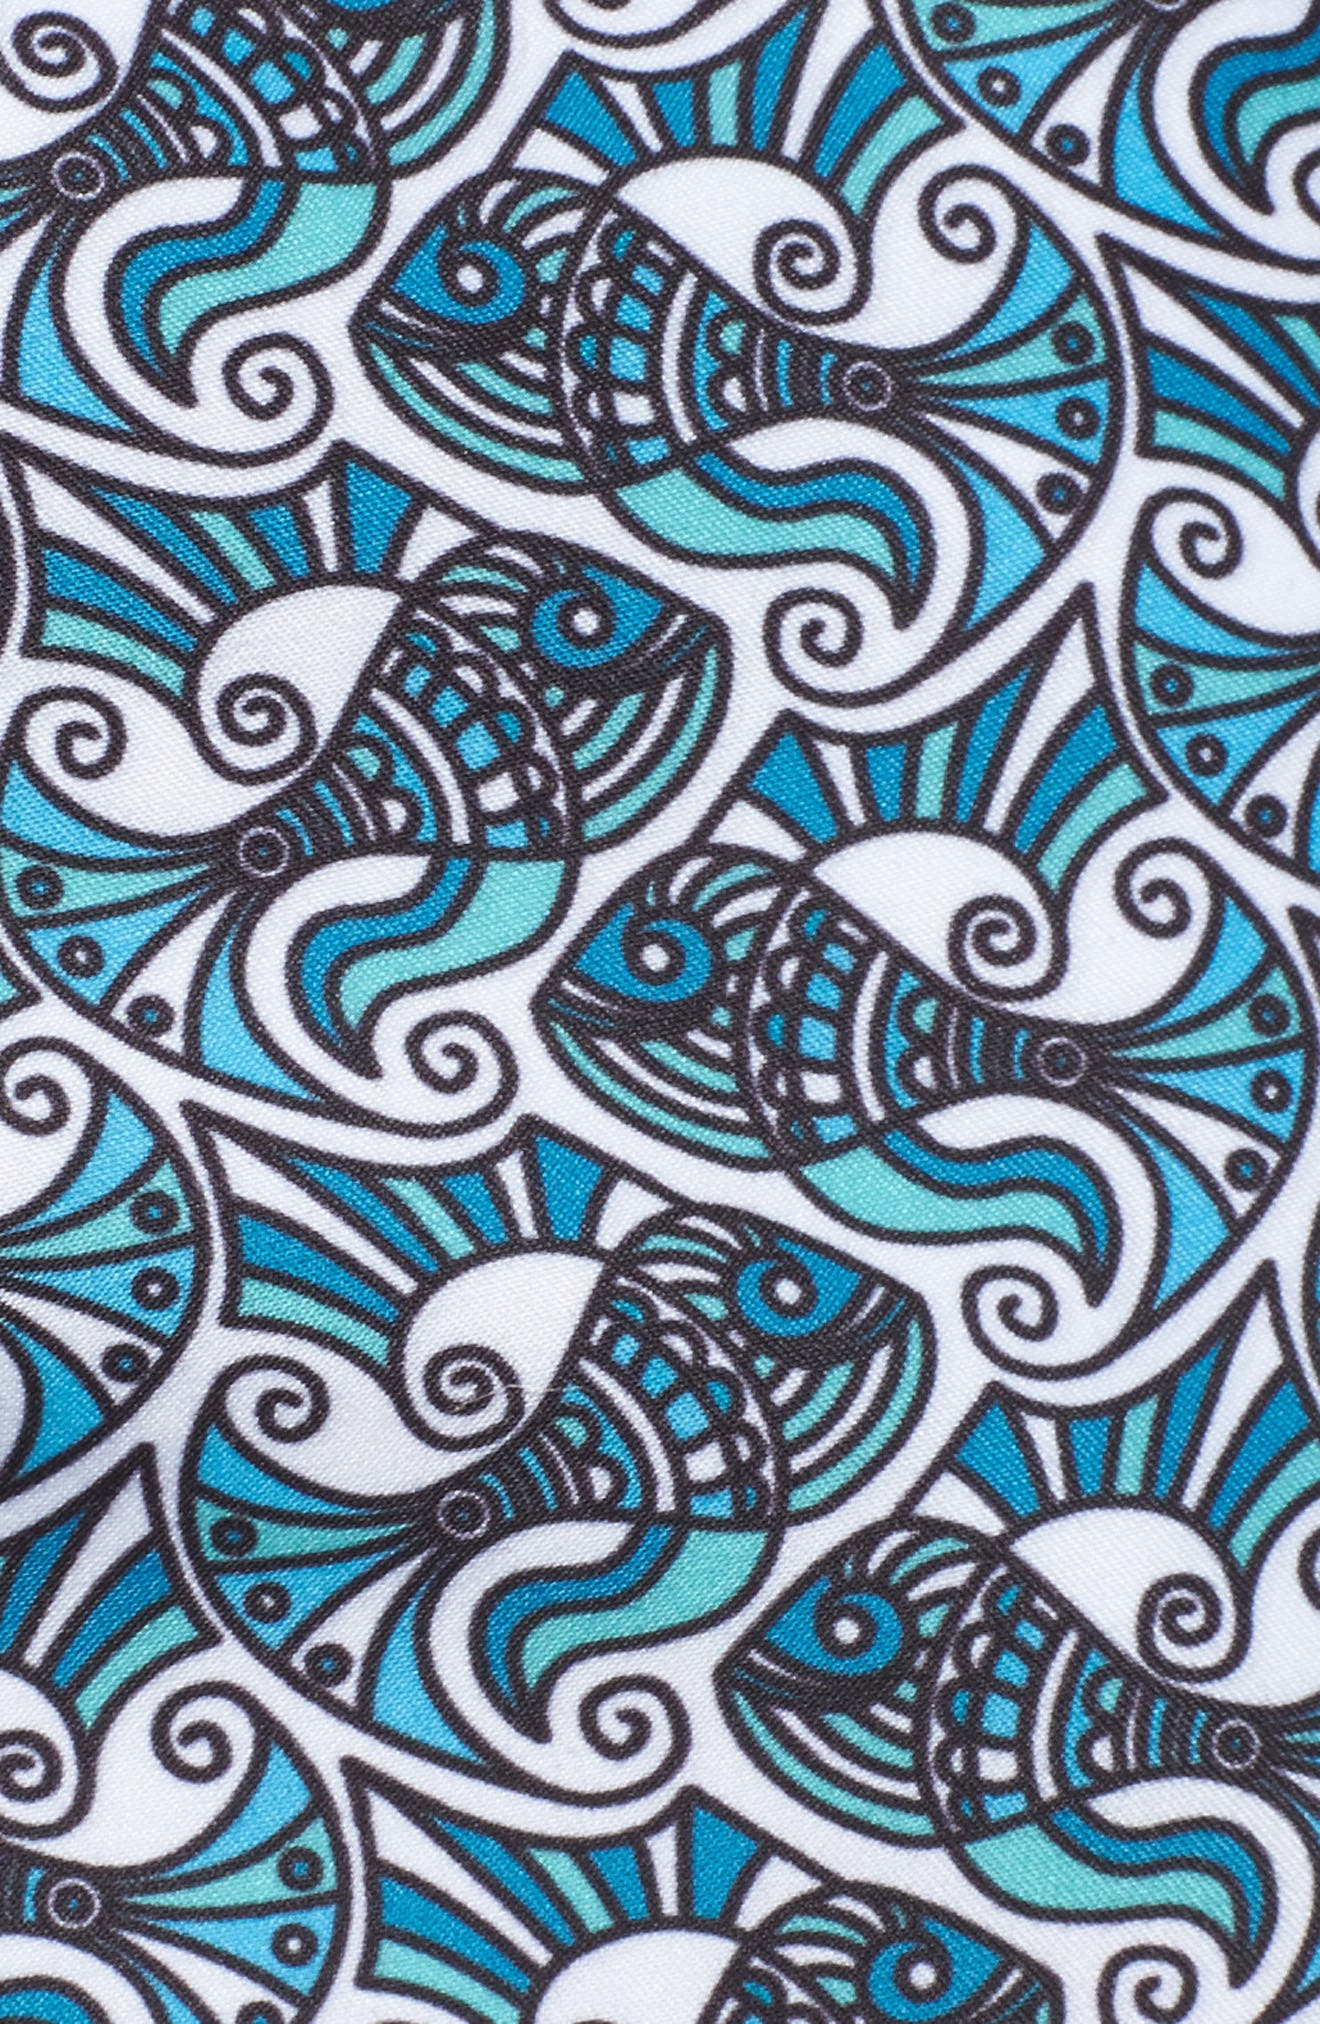 Mr. Swim Fish Swirls Print Swim Trunks,                             Alternate thumbnail 5, color,                             440